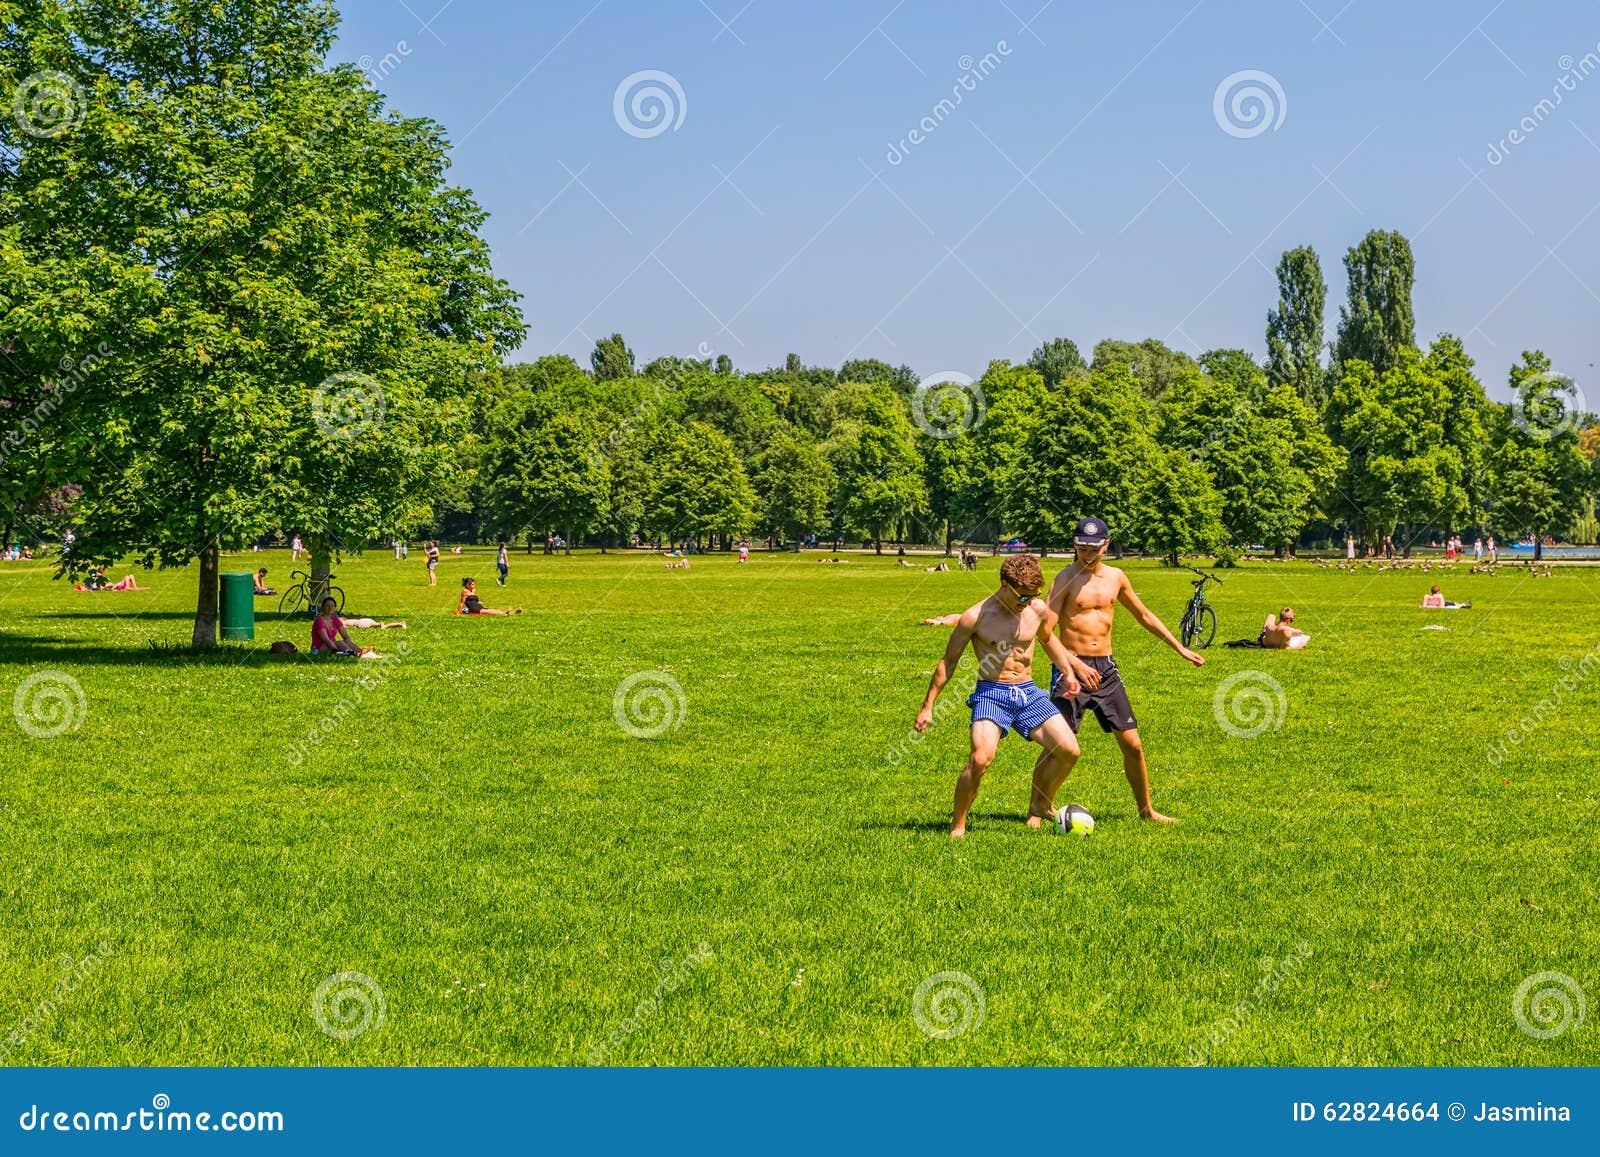 Munich English Garden Park Editorial Stock Image Image